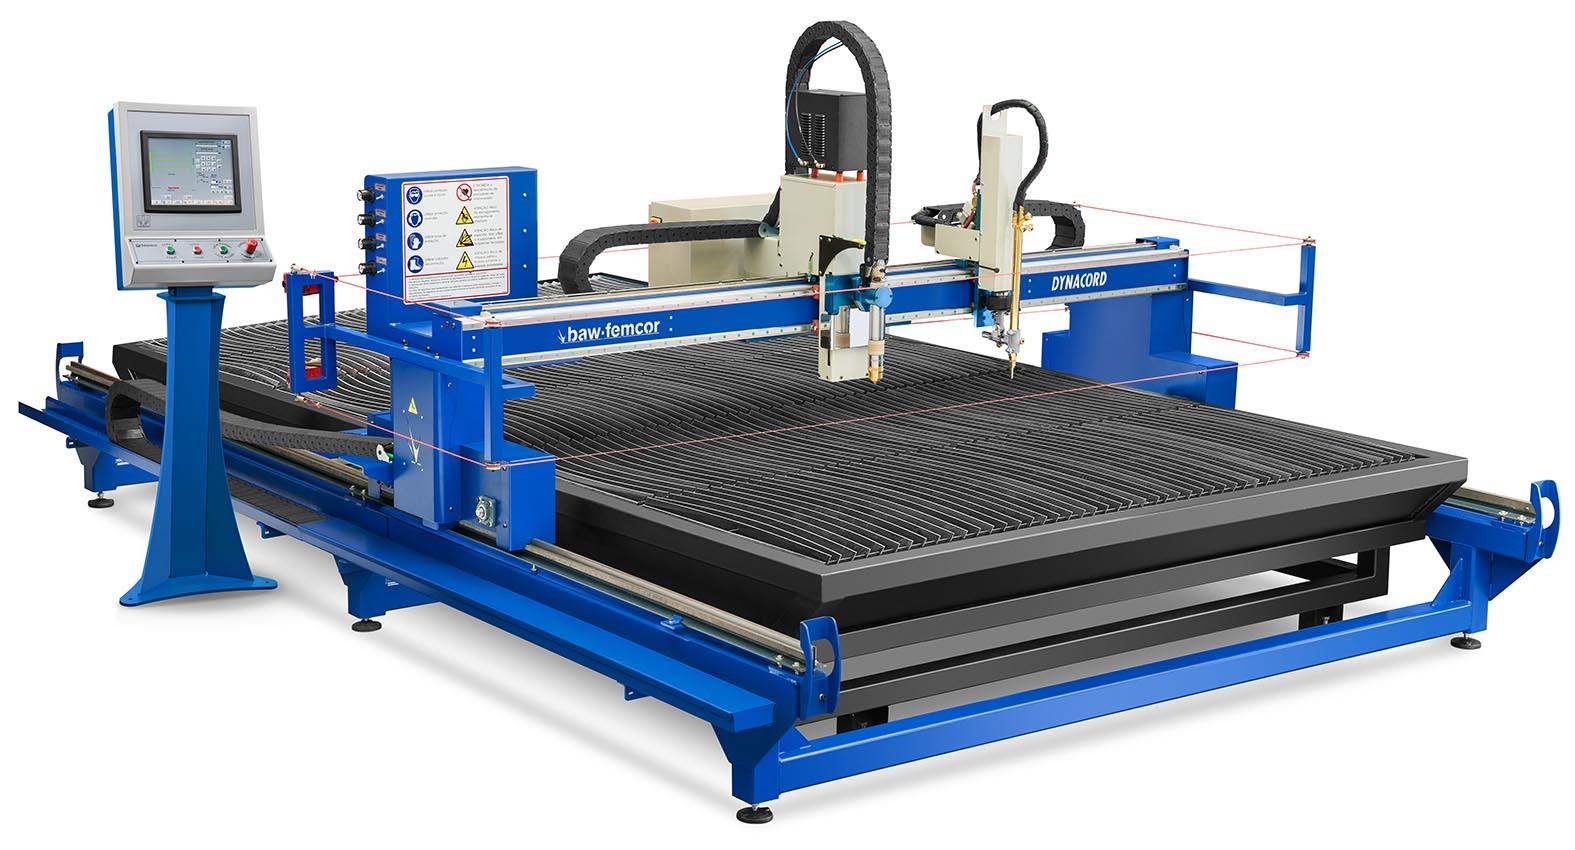 DynaCord Máquina Plasma CNC